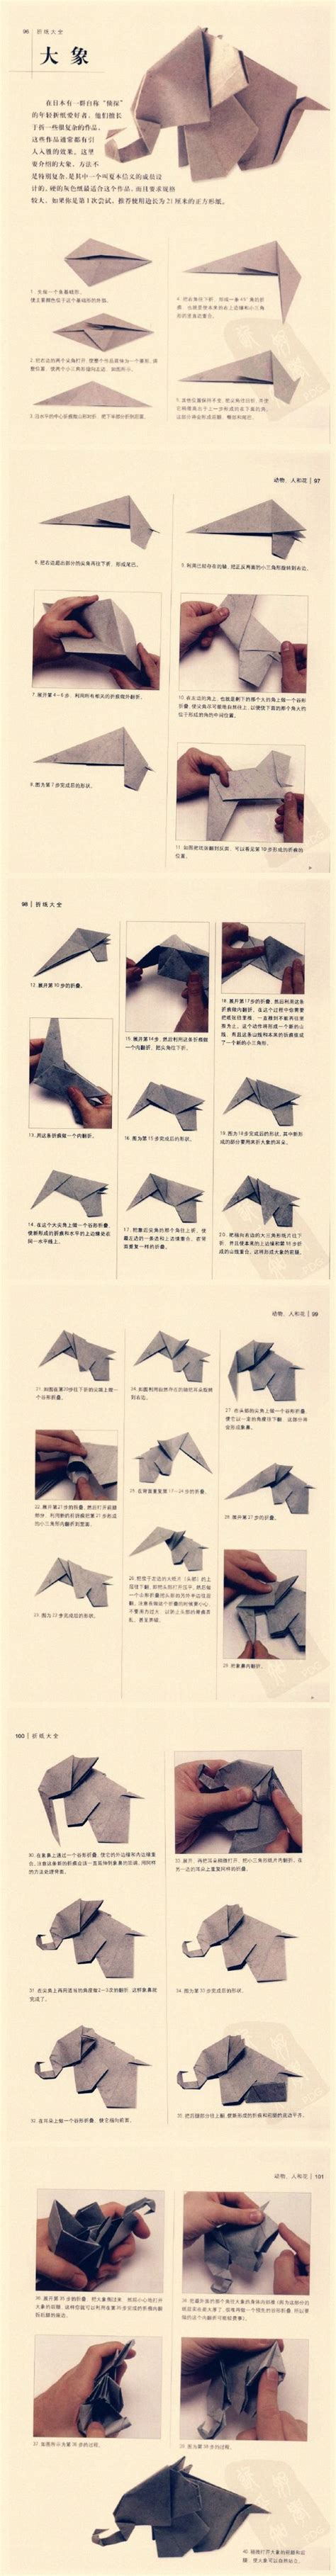 Origami Elephants - origami elephant 233 l 233 phant origami